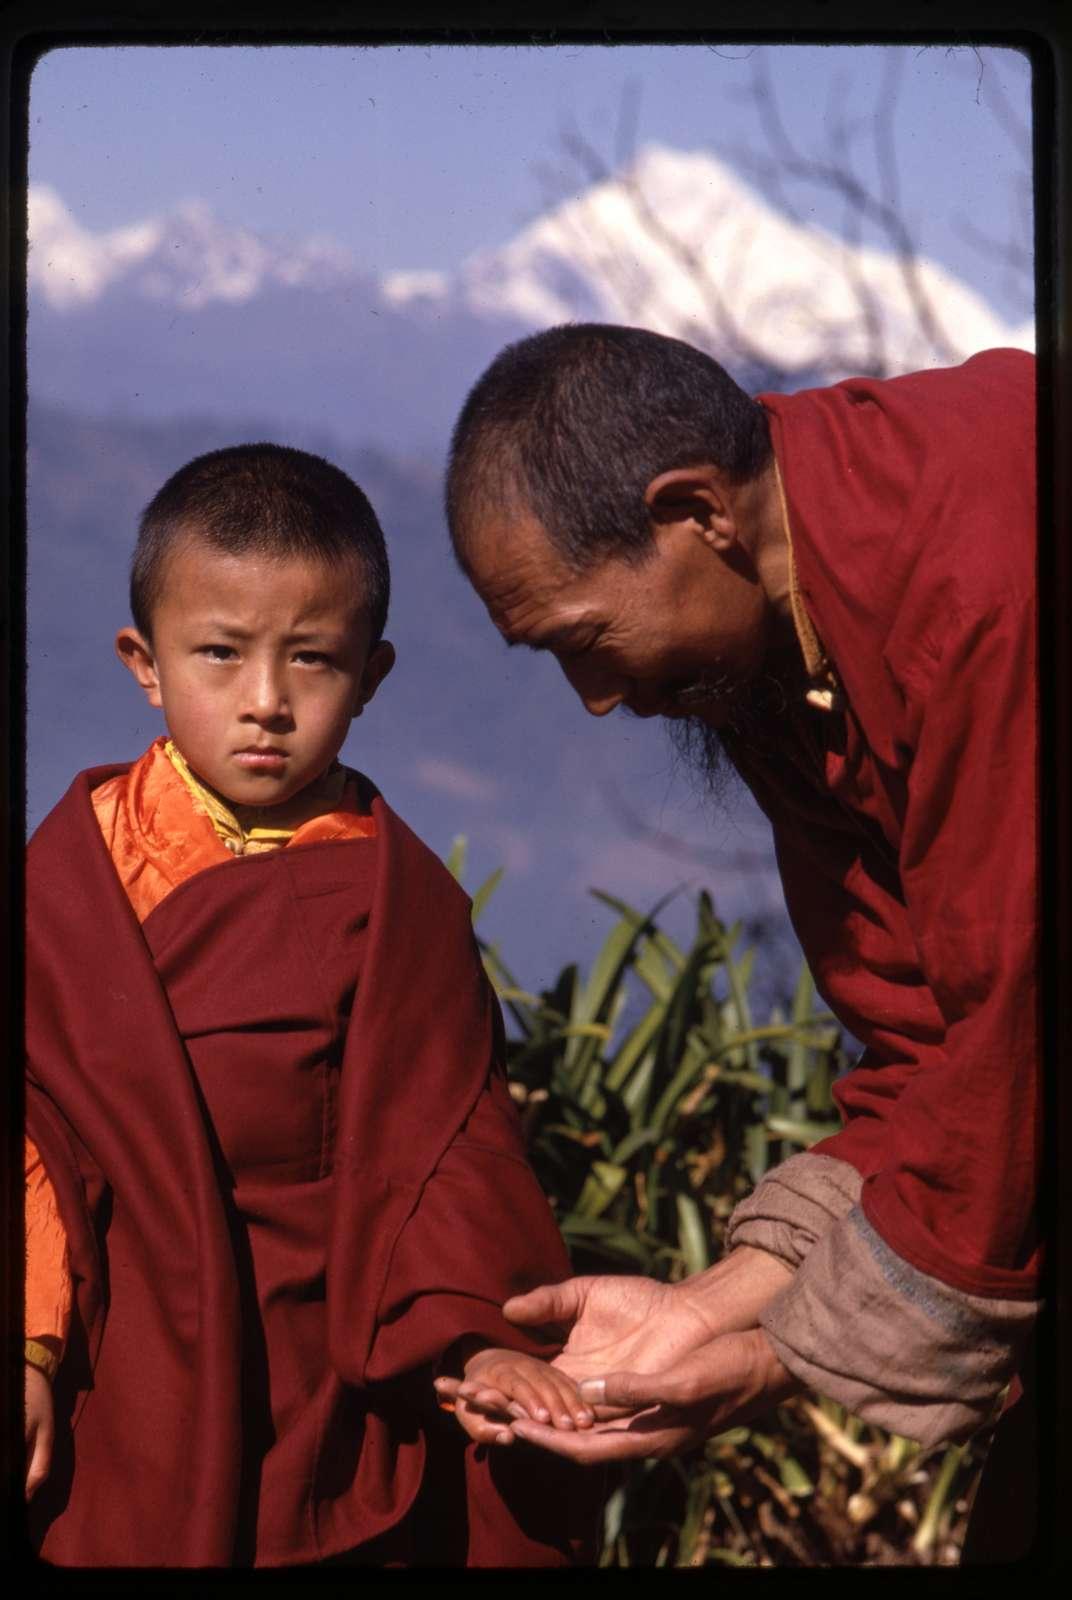 Holiest reincarnate in Sikkim with teacher, Mt. Khangchondzonga [in] background